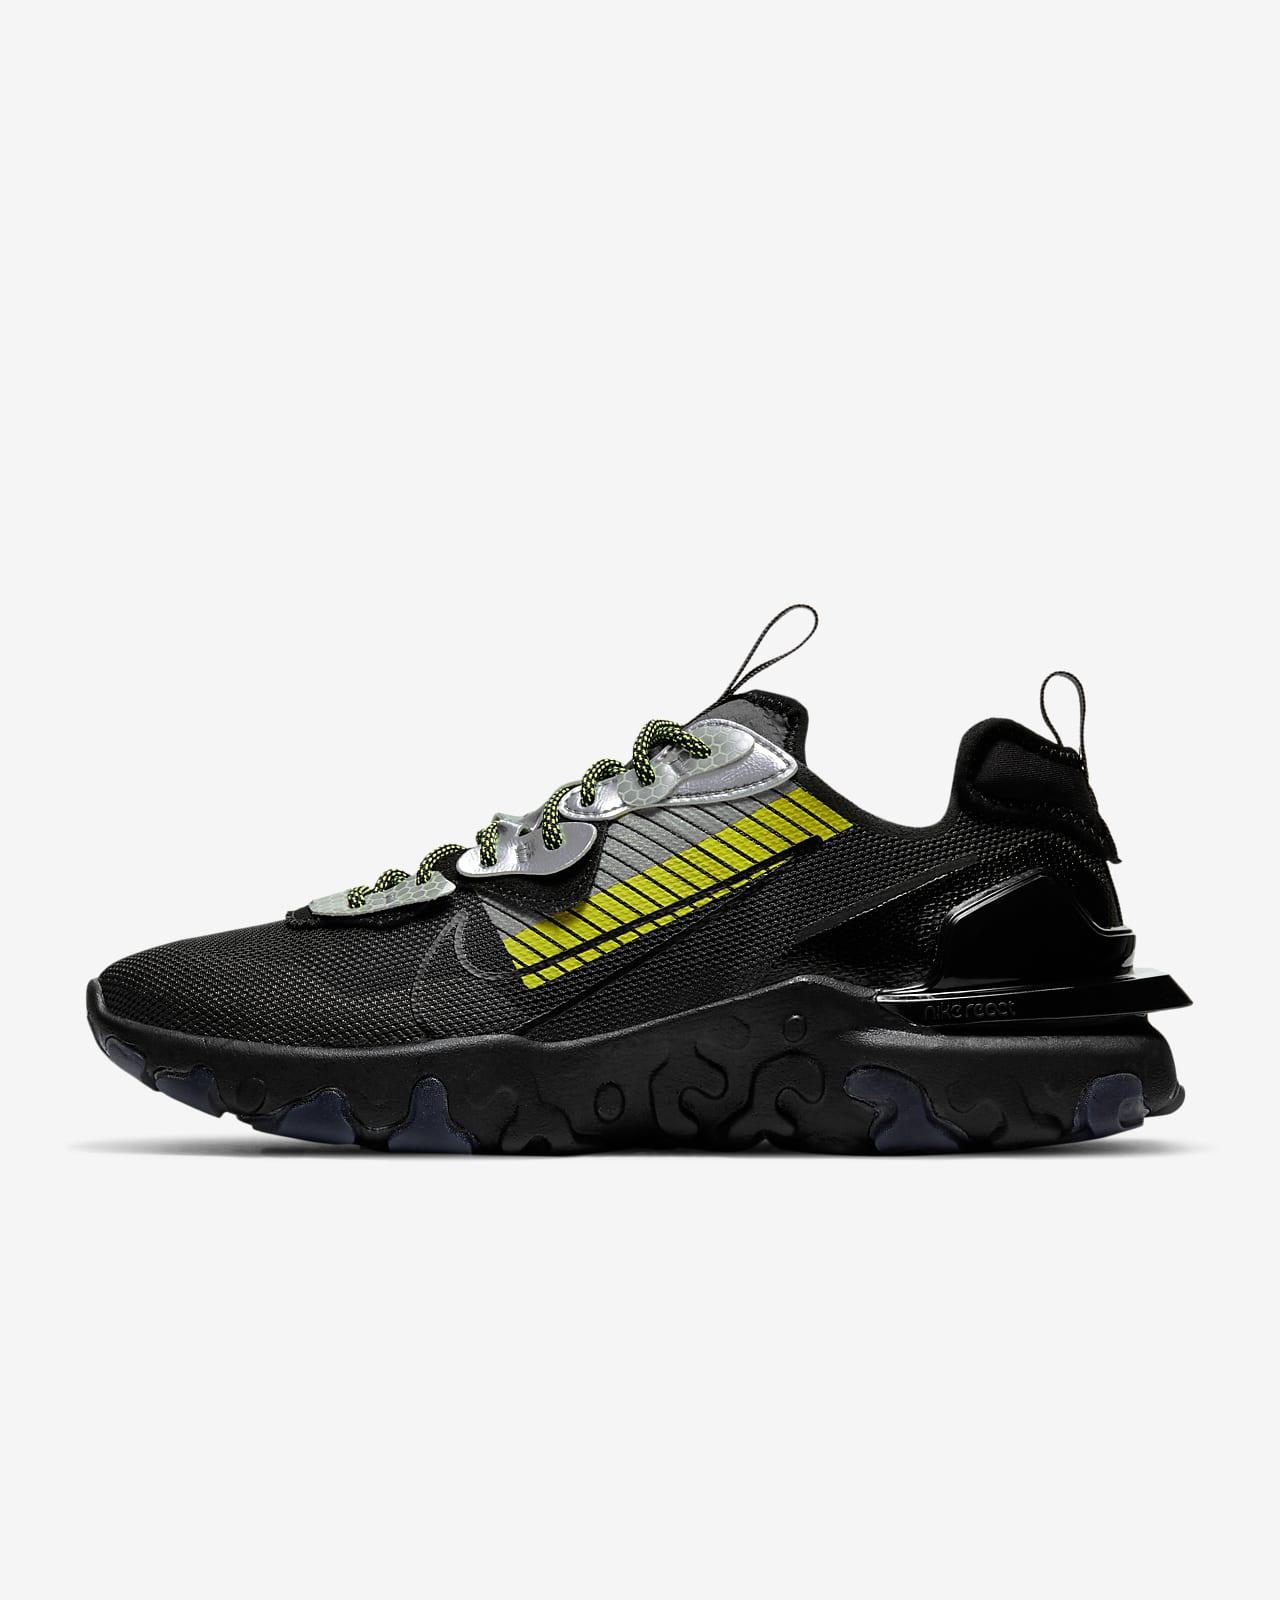 Pánská bota Nike React Vision PRM 3M™